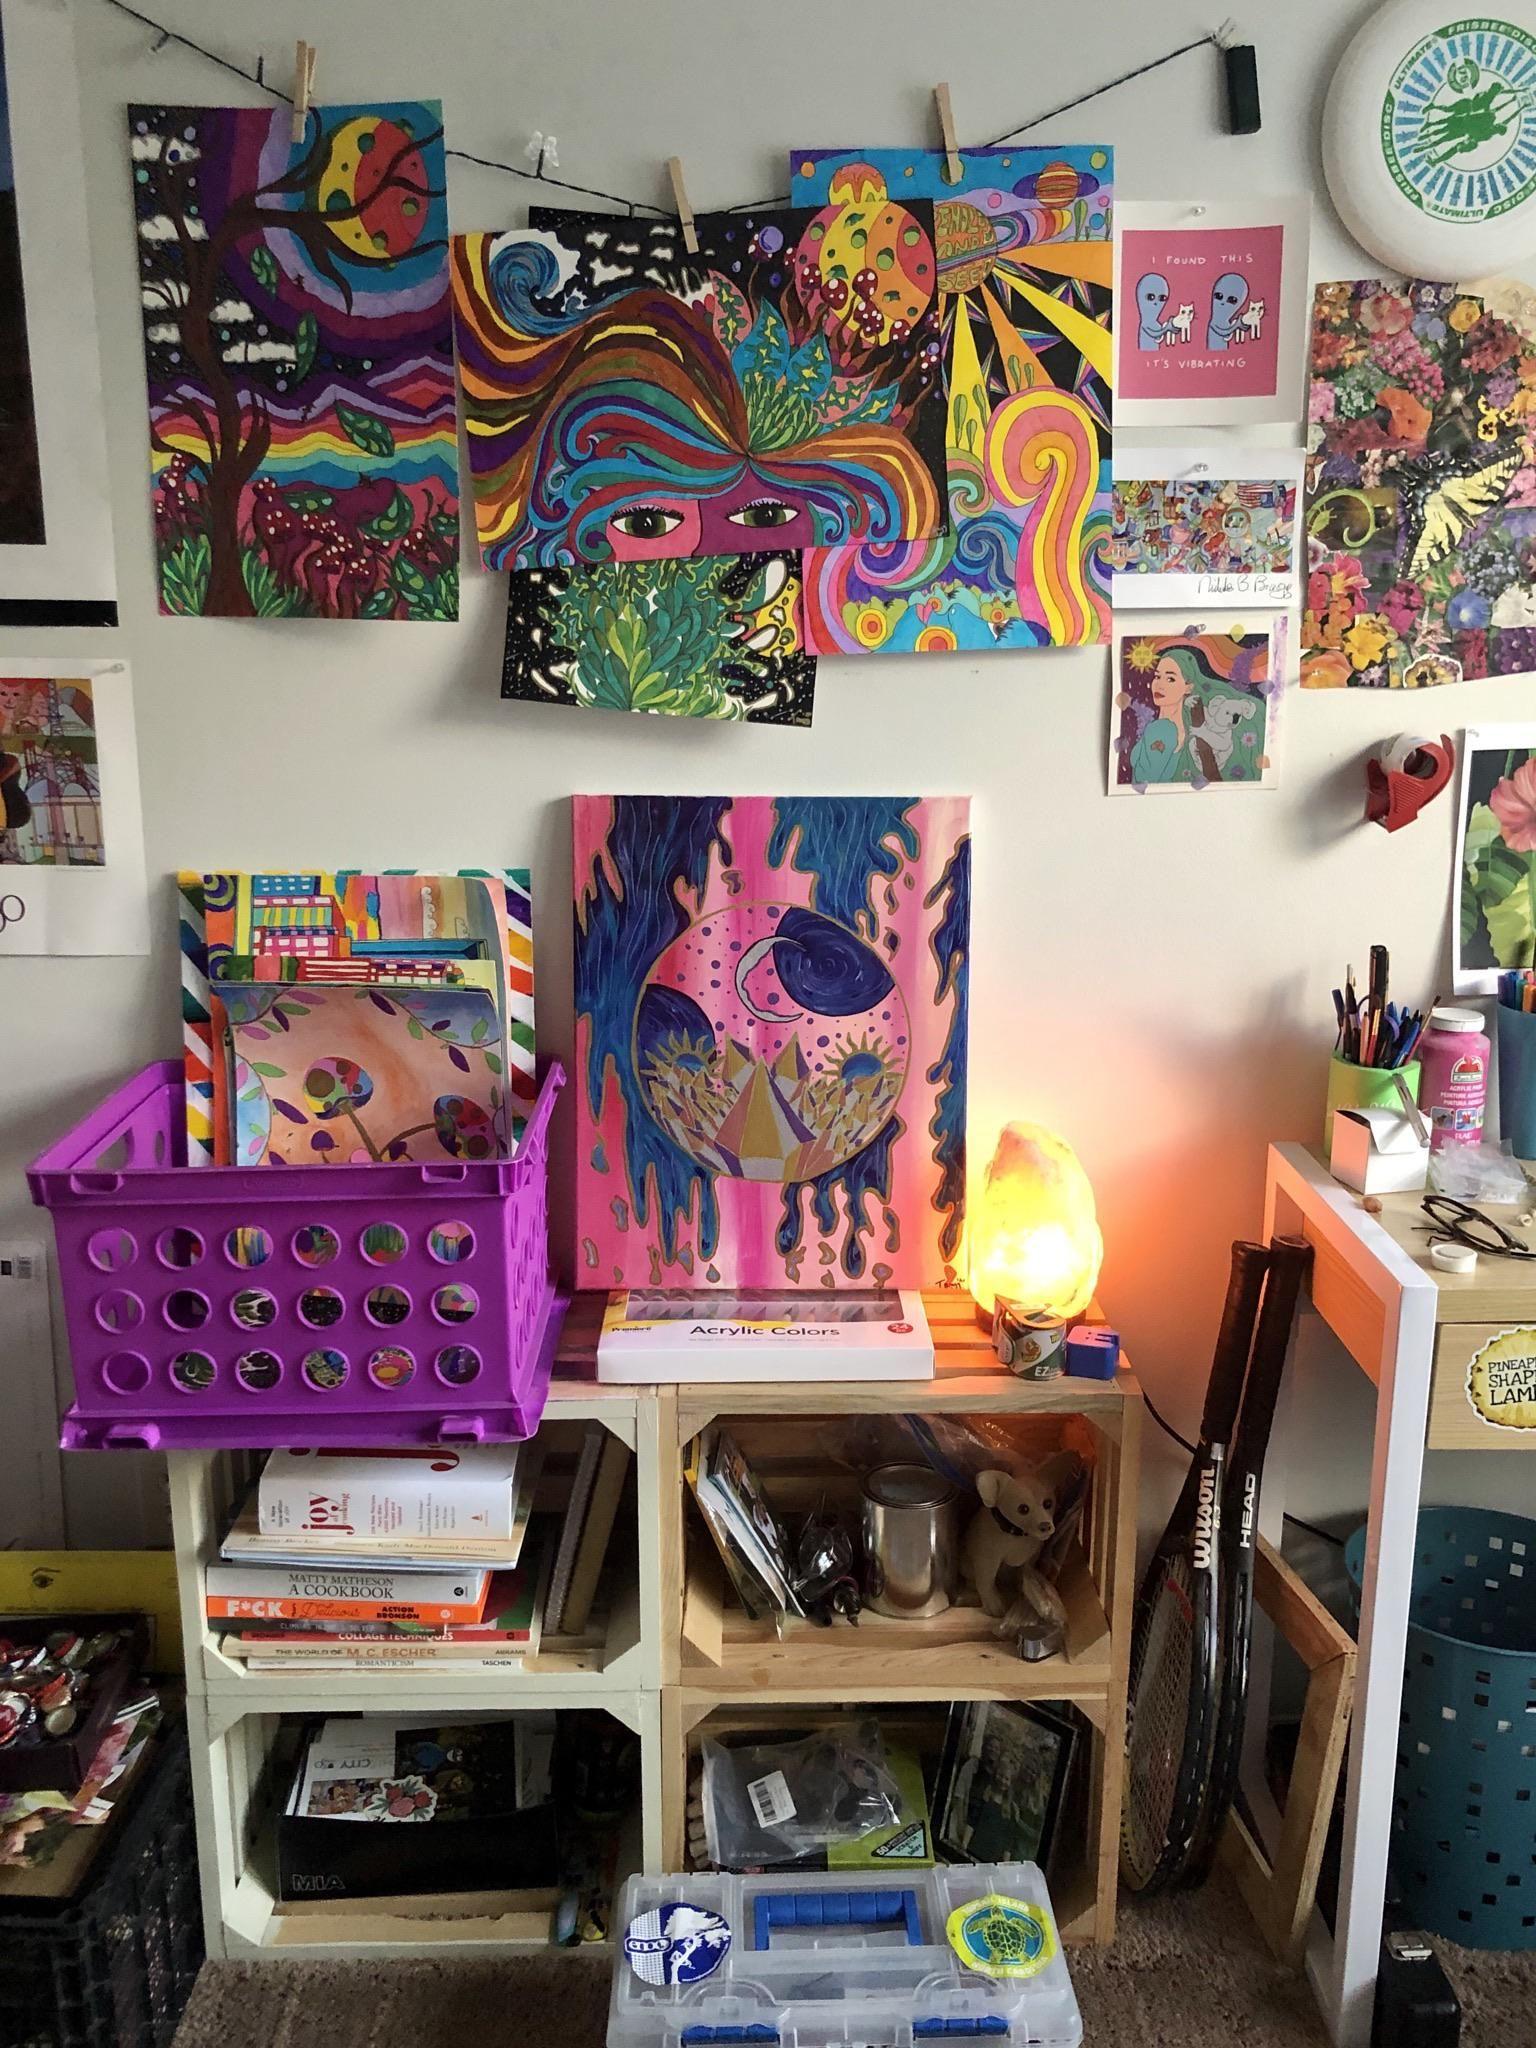 My cozy little studio in 2020 | Indie room decor, Indie ...